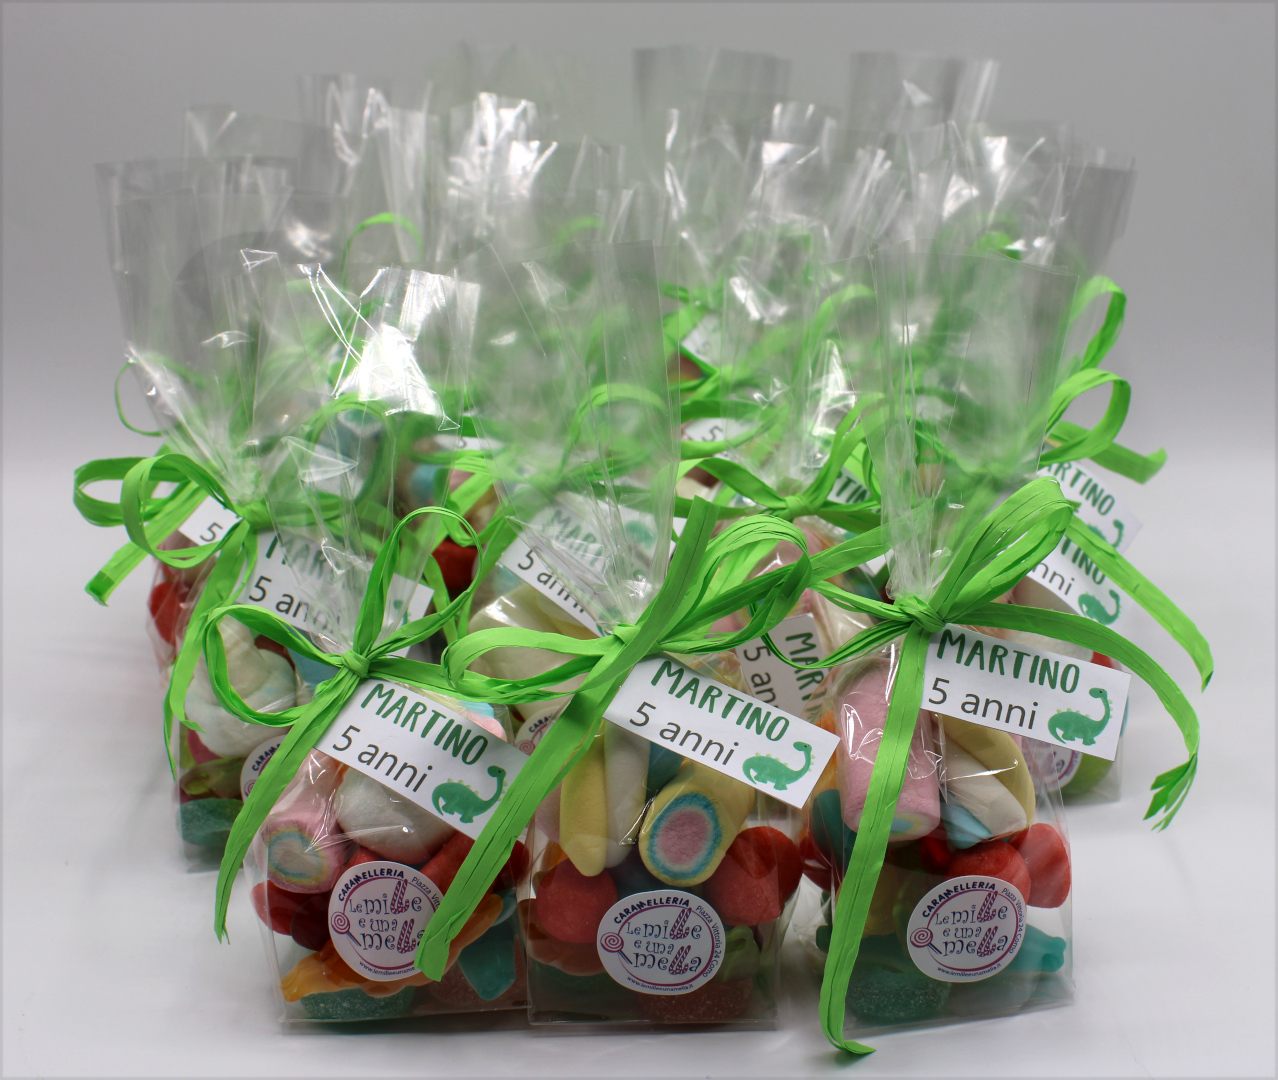 regali fine festa party favor caramelle vendita online Le Mille e una Mella